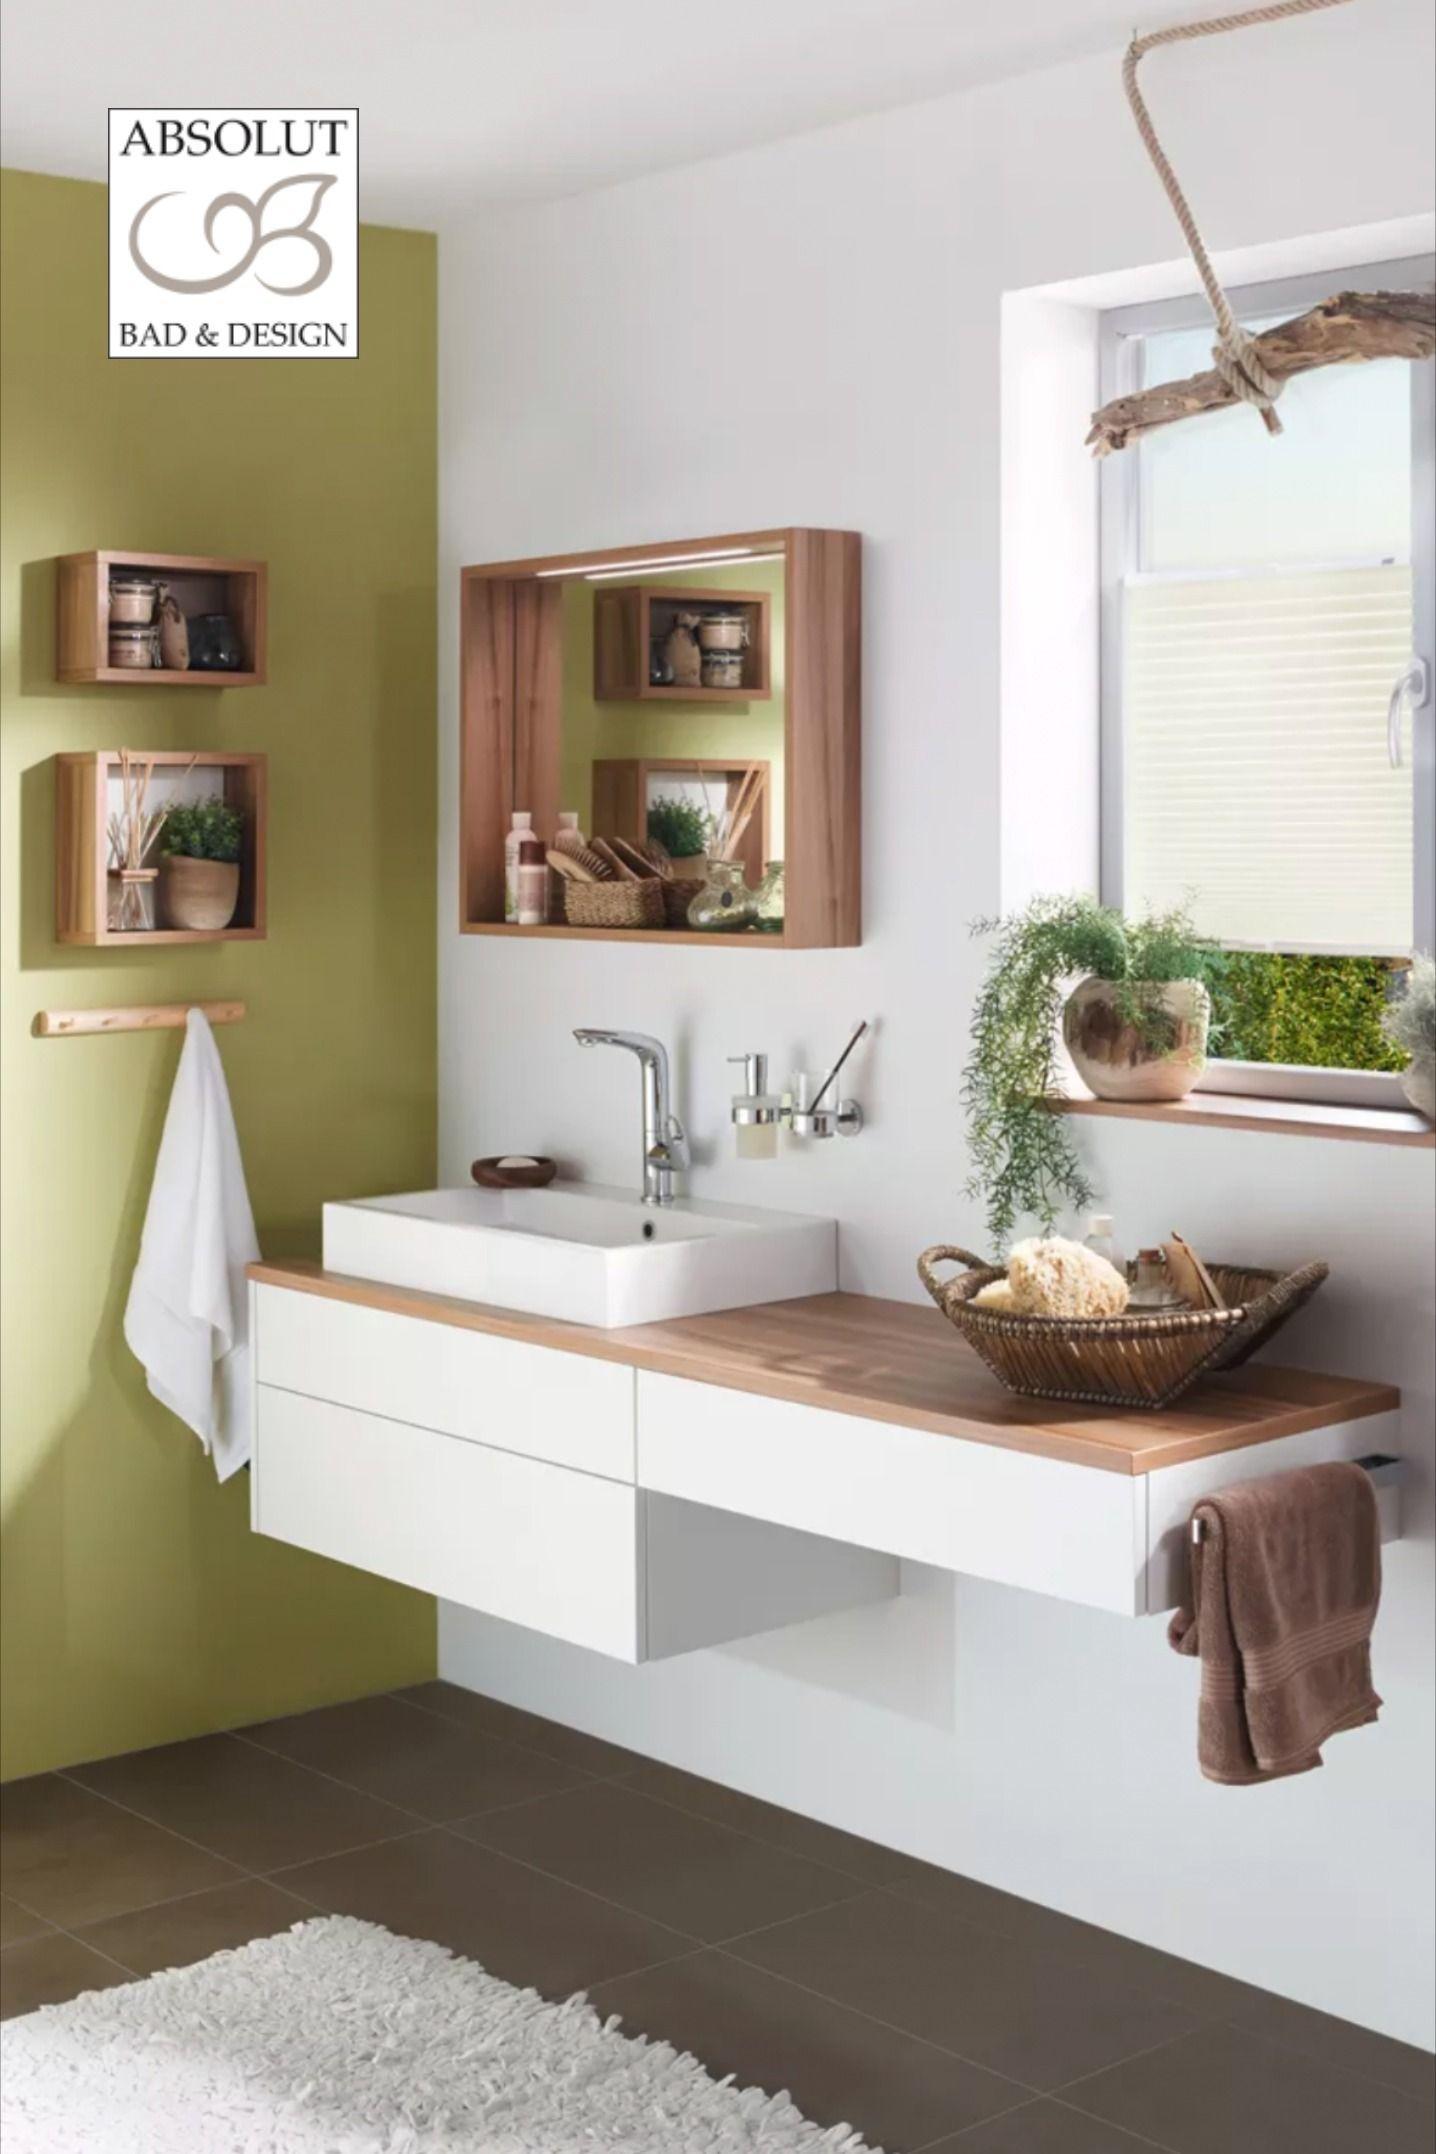 Badezimmer Badmobel Badezimmermobel Badmobel Set Spiegelschrank Bad Badezimmerschrank Badspiegel Badheizkorper In 2020 Bathroom Decor Interior Home And Living